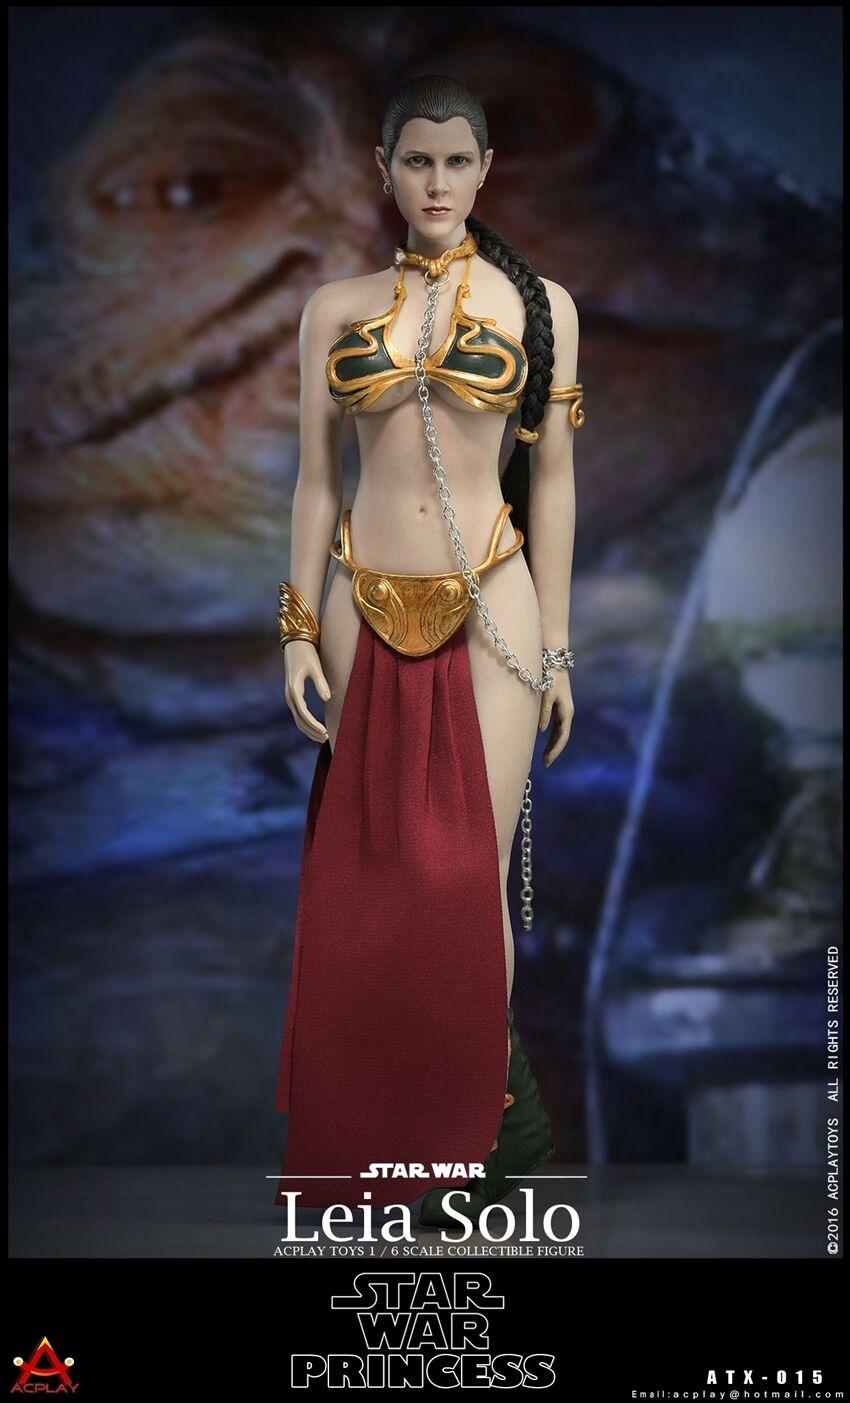 ACPLAY Star War Princess Leia Solo Suit w/Head 1/6 Fit Phicen Kumik Female body